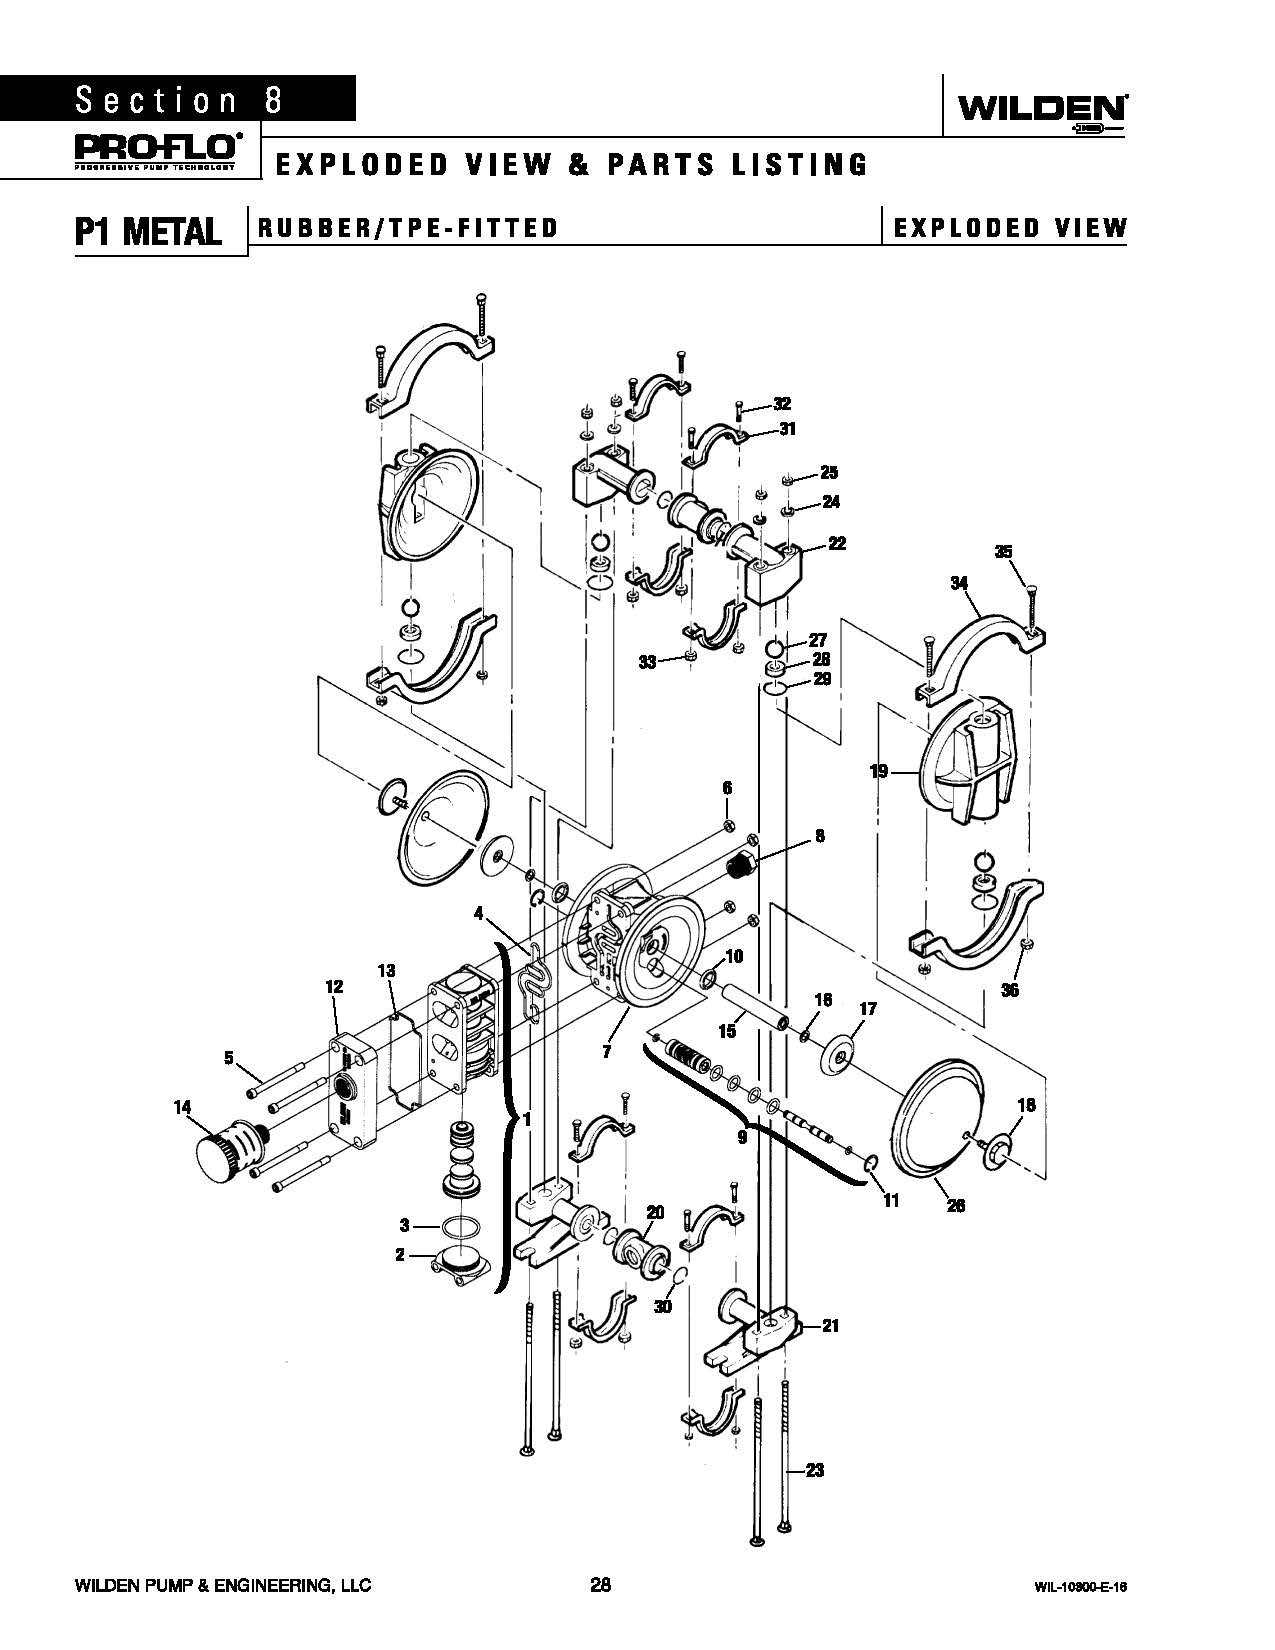 Wilden P1 Original Metal Rubber Fitted